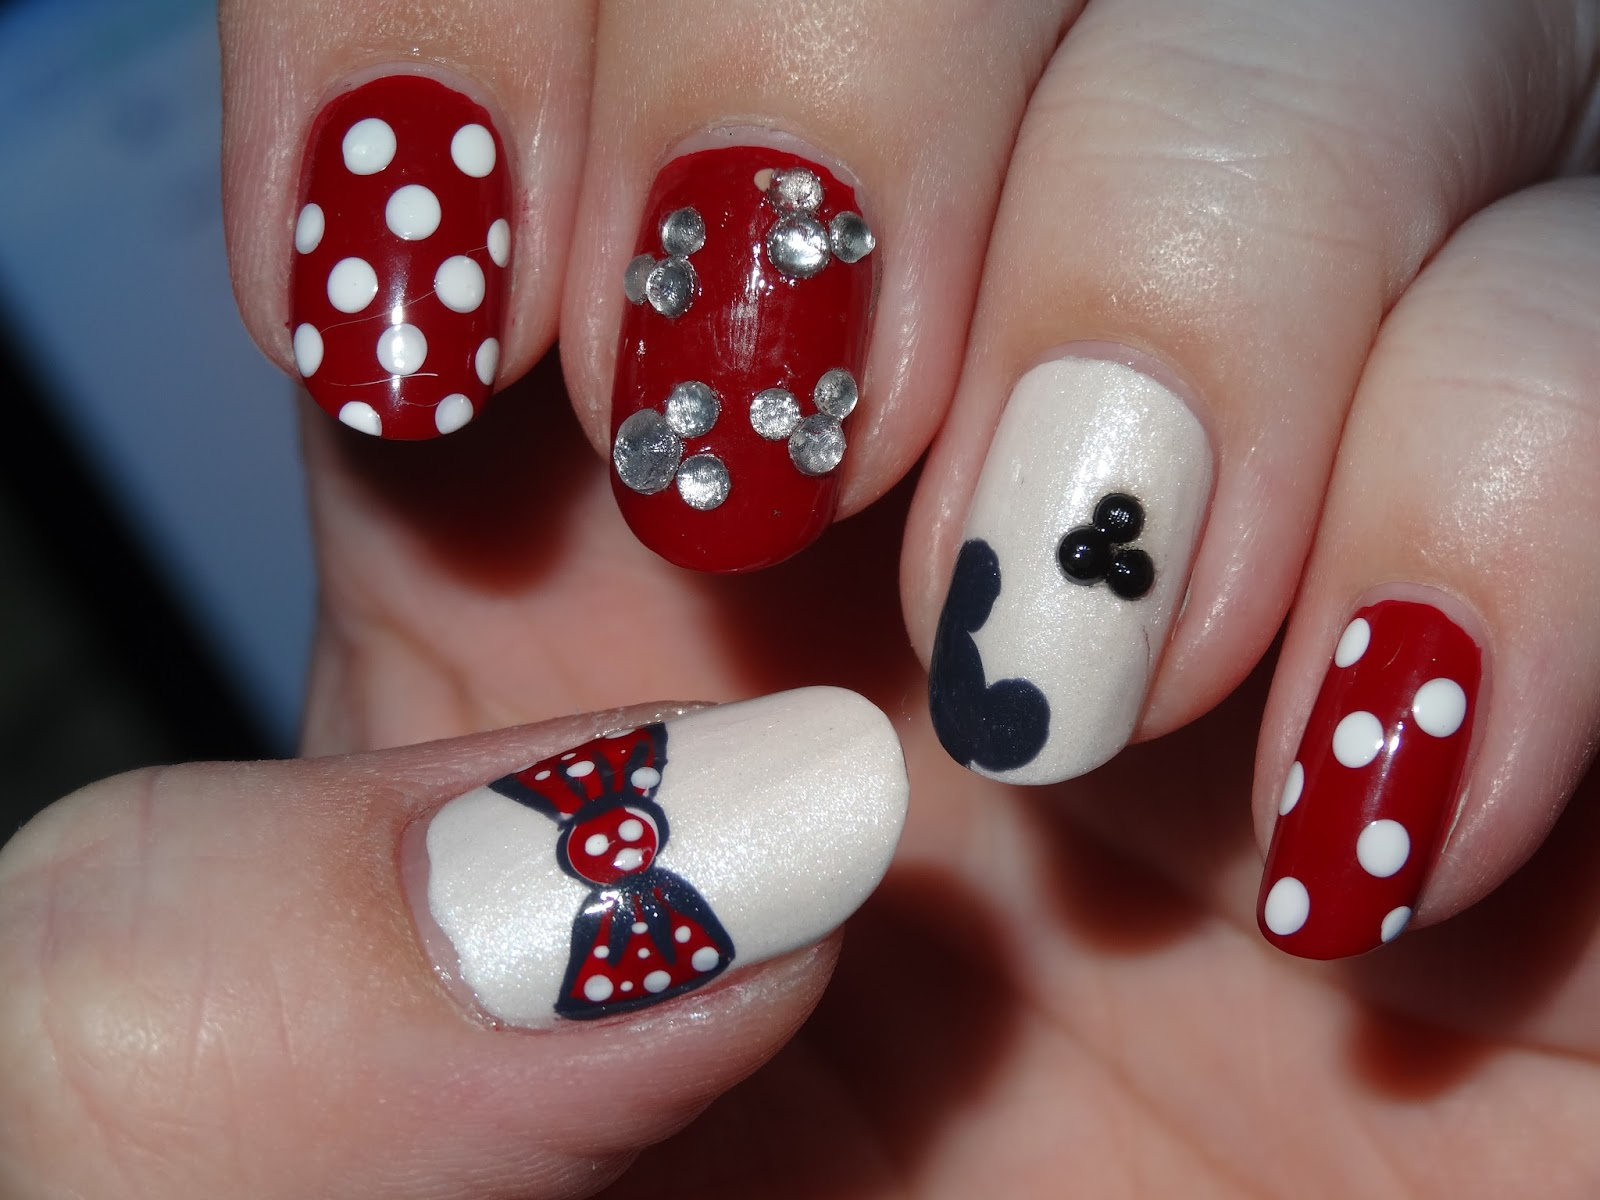 polishlover: kiko 240 - Apple Red & Mickey Mouse Manicure